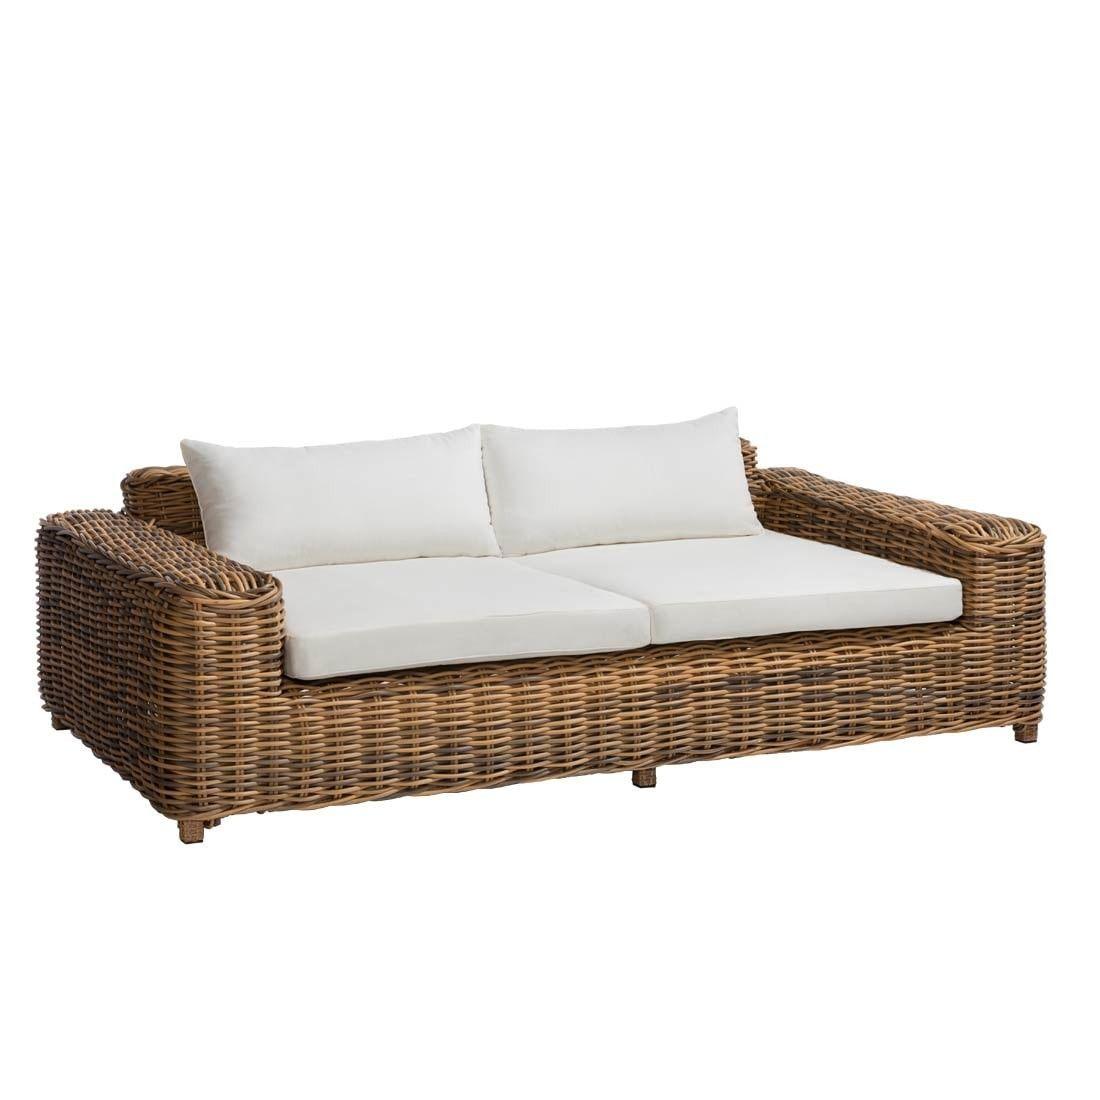 Outliv Versailles Luxury 2 Sitzer Sofa Geflecht Lounge Sofa Garten Rattan Lounge Mobel Wohnzimmerbeleuchtung